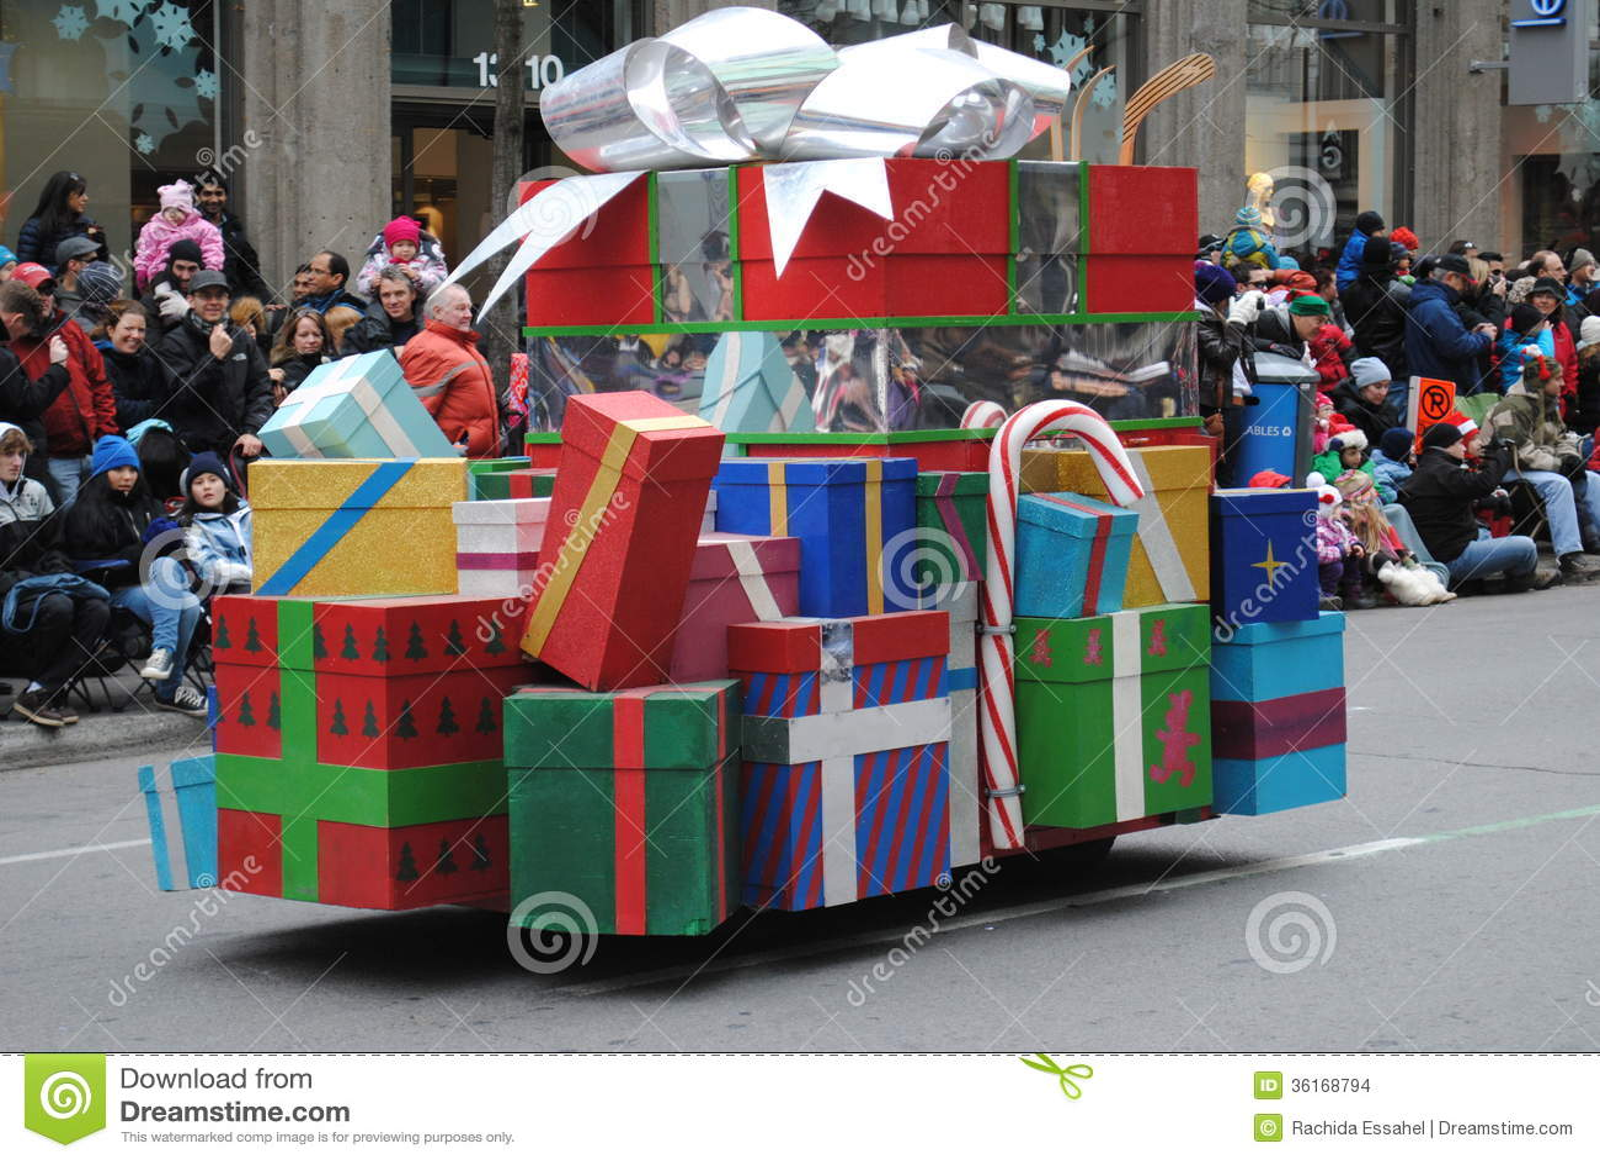 Festival de santa clous en Montreal